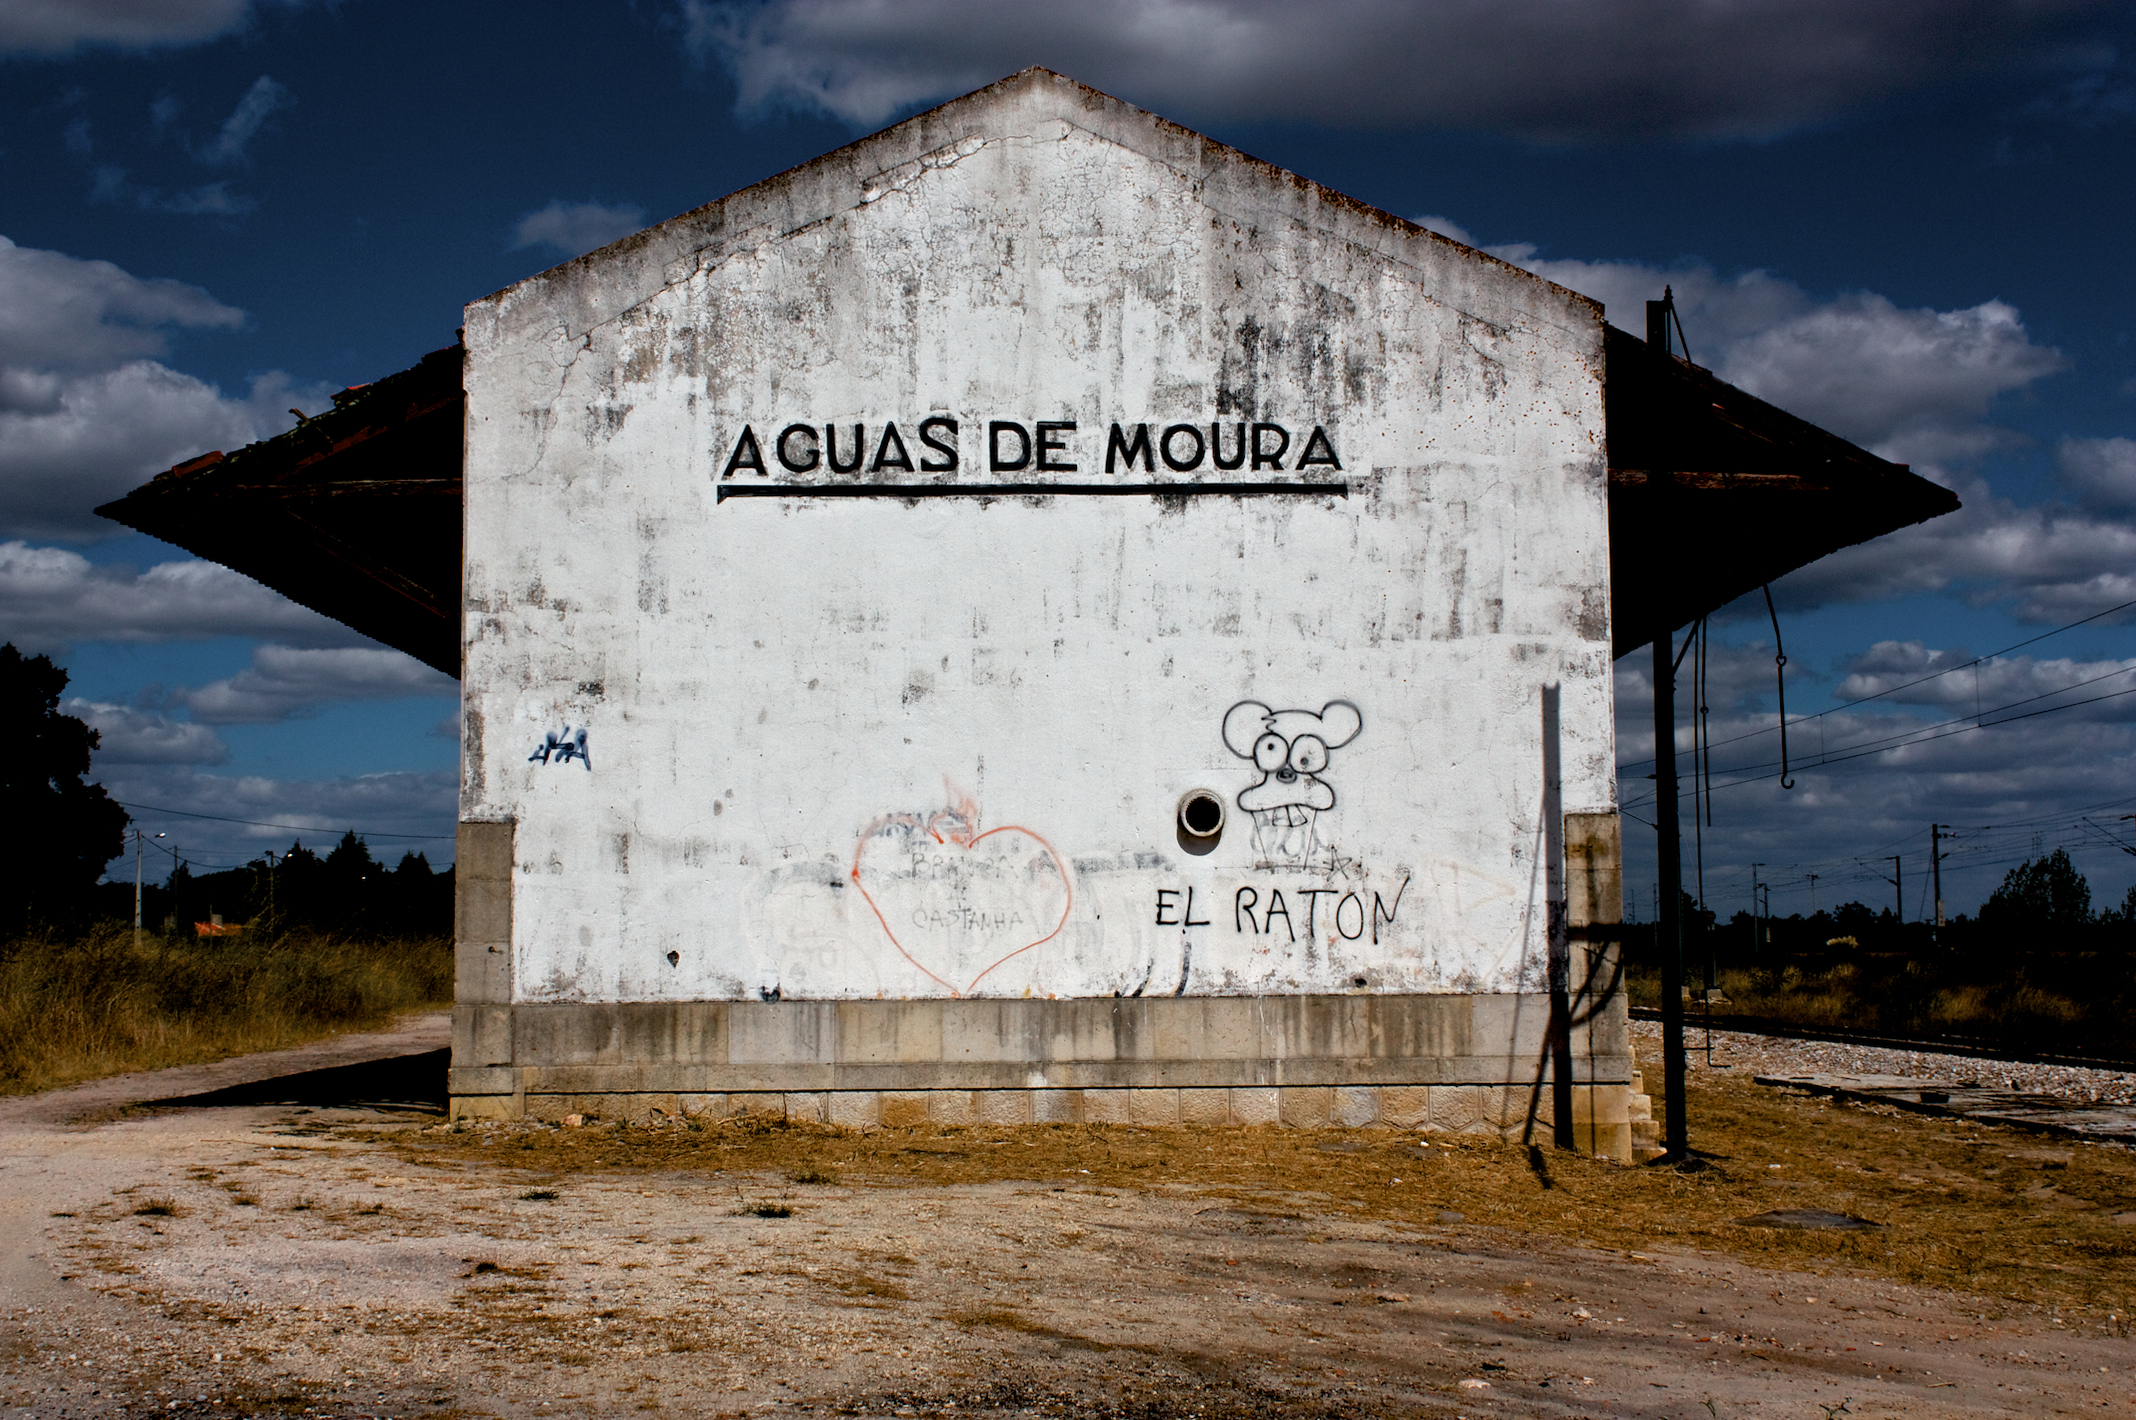 File Estacao De Aguas De Moura 2010 09 08 4973765355 Jpg